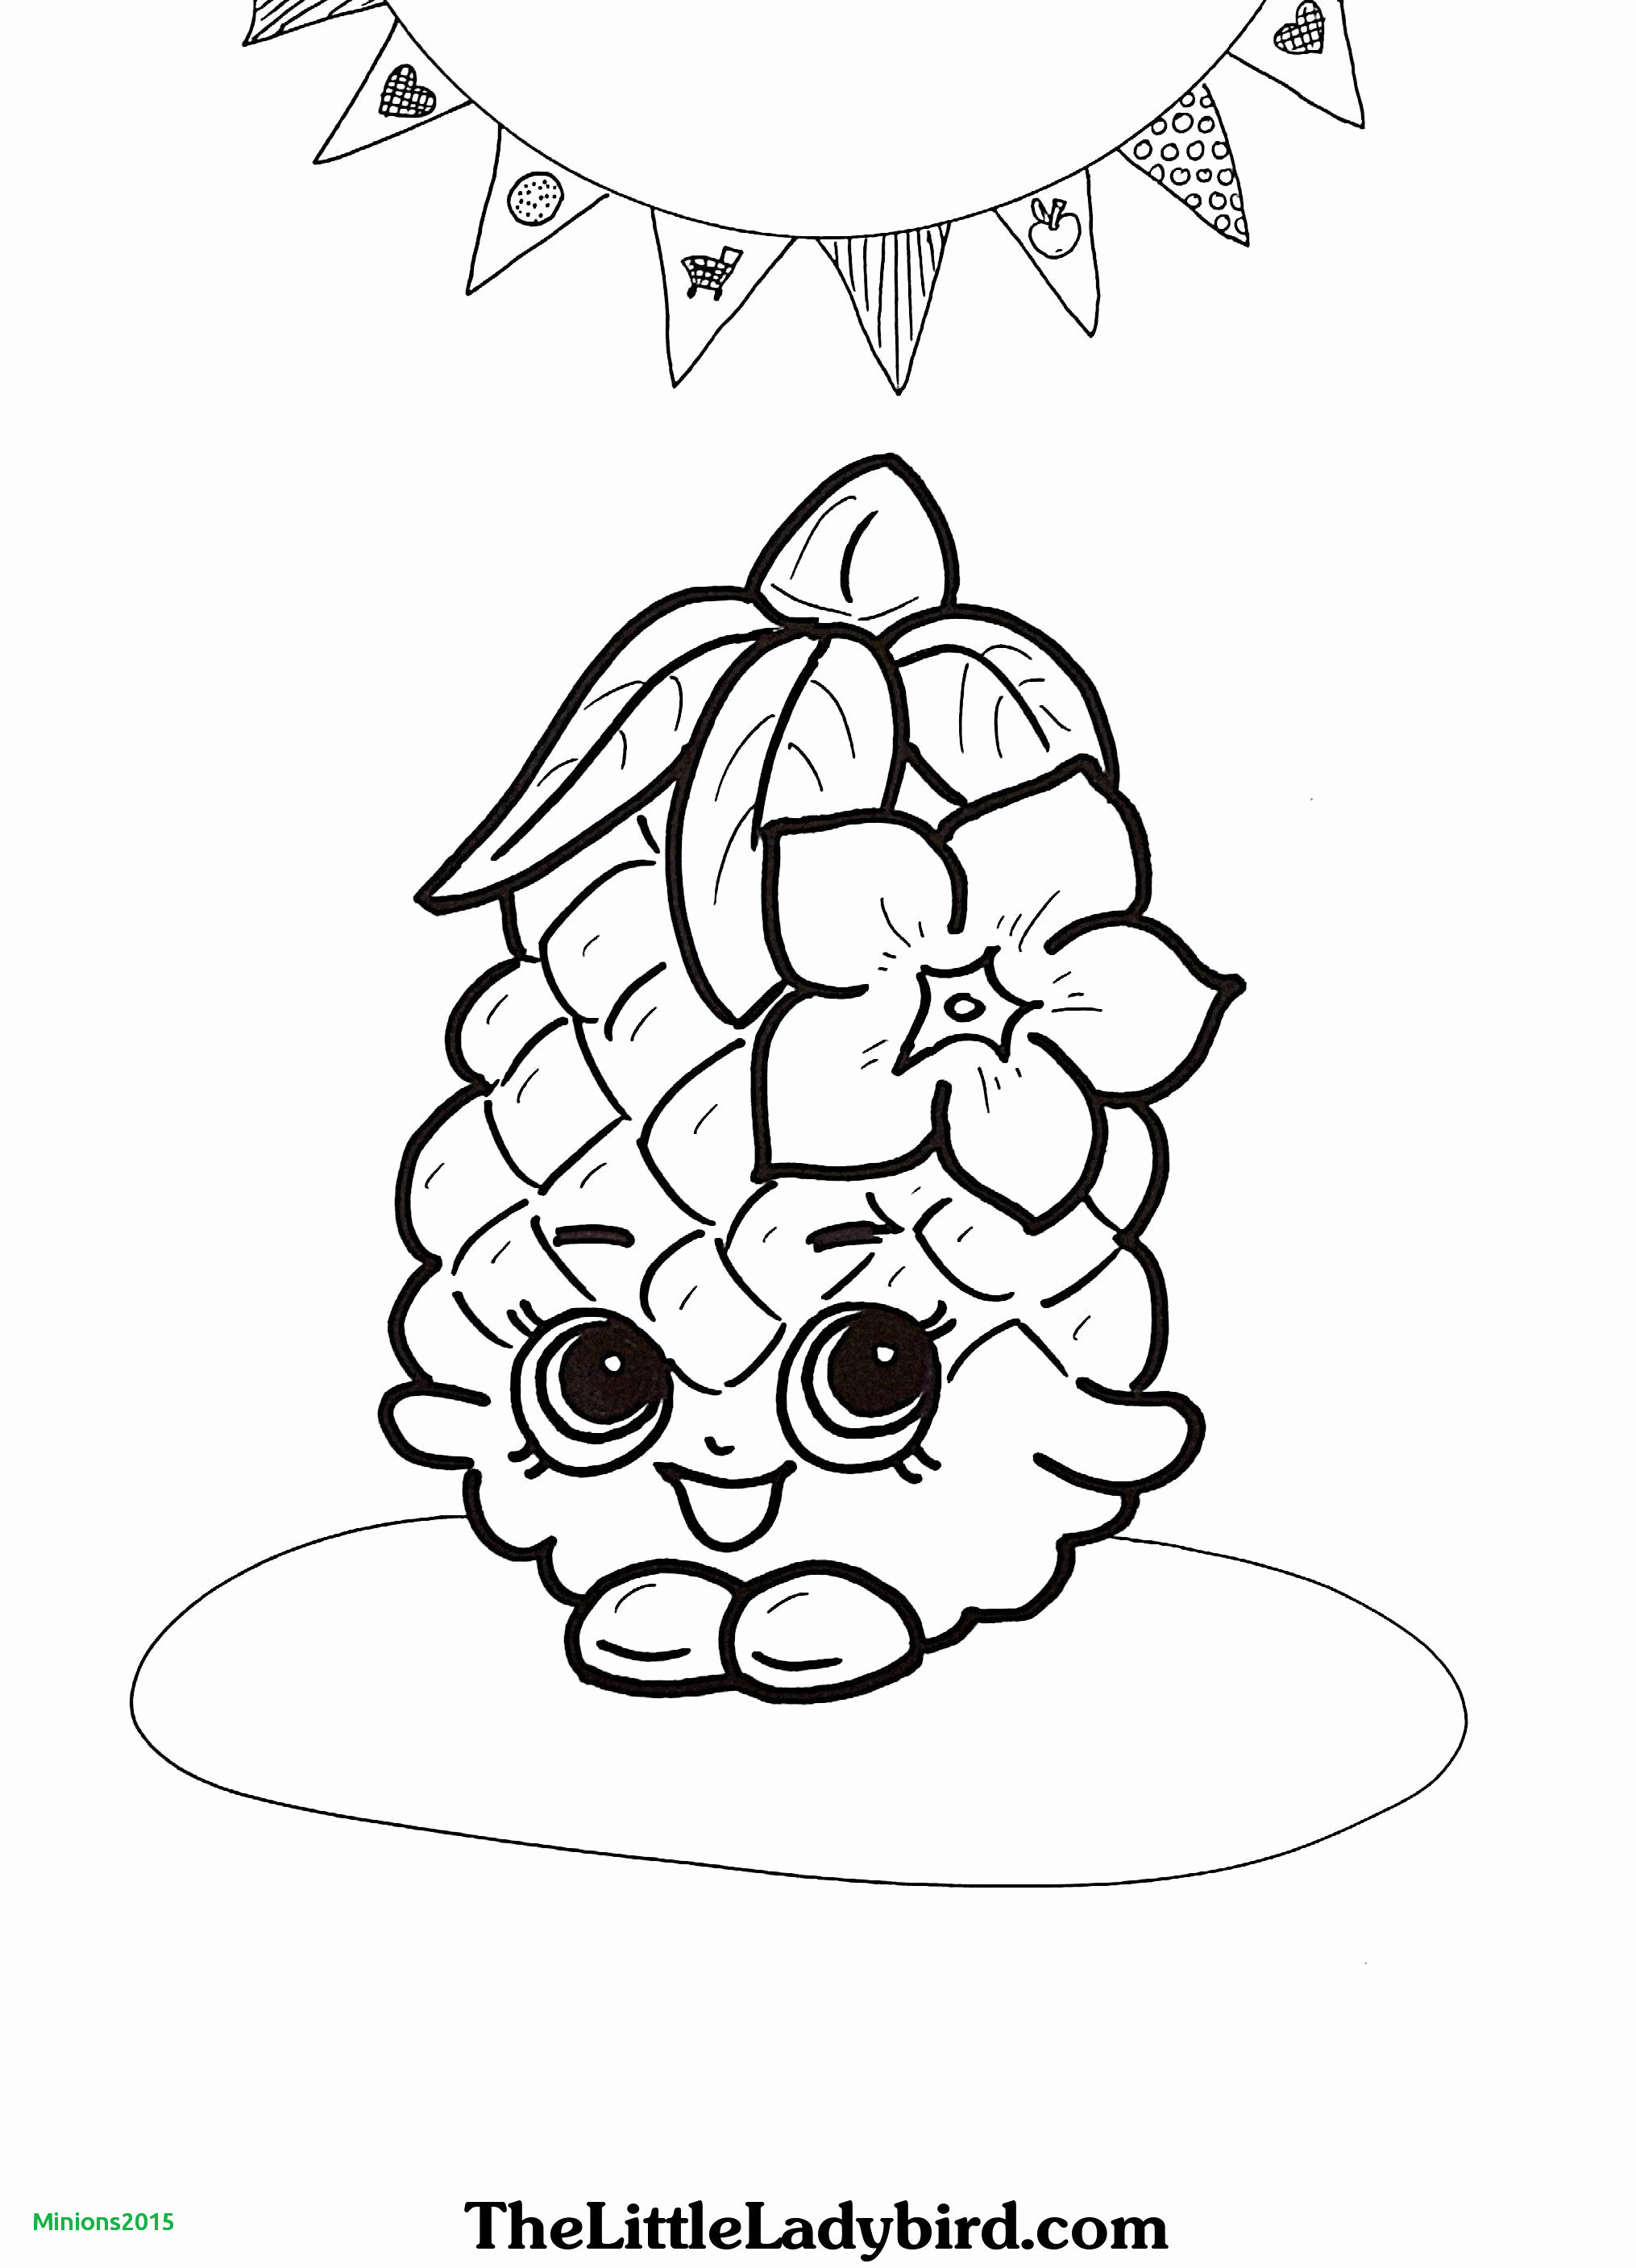 Bilder Zum Ausmalen Minions Inspirierend Minion Bob to Color Awesome Minions Stuart Drawing Fresh Minion Fotos